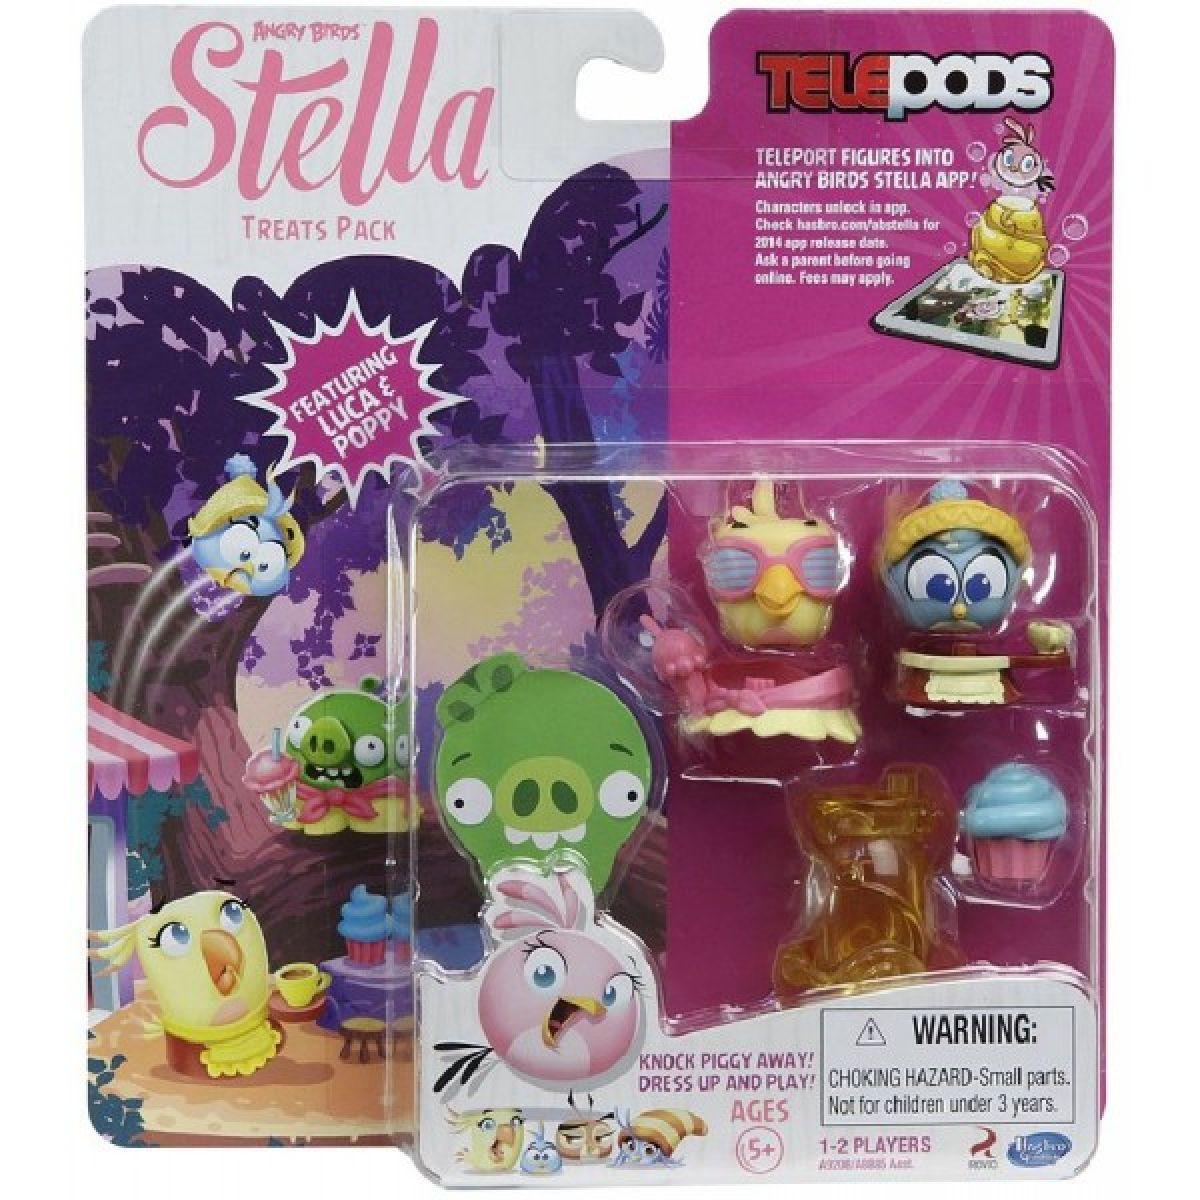 Angry Birds figurky Telepods Stella s rampou - Luca a Poppy